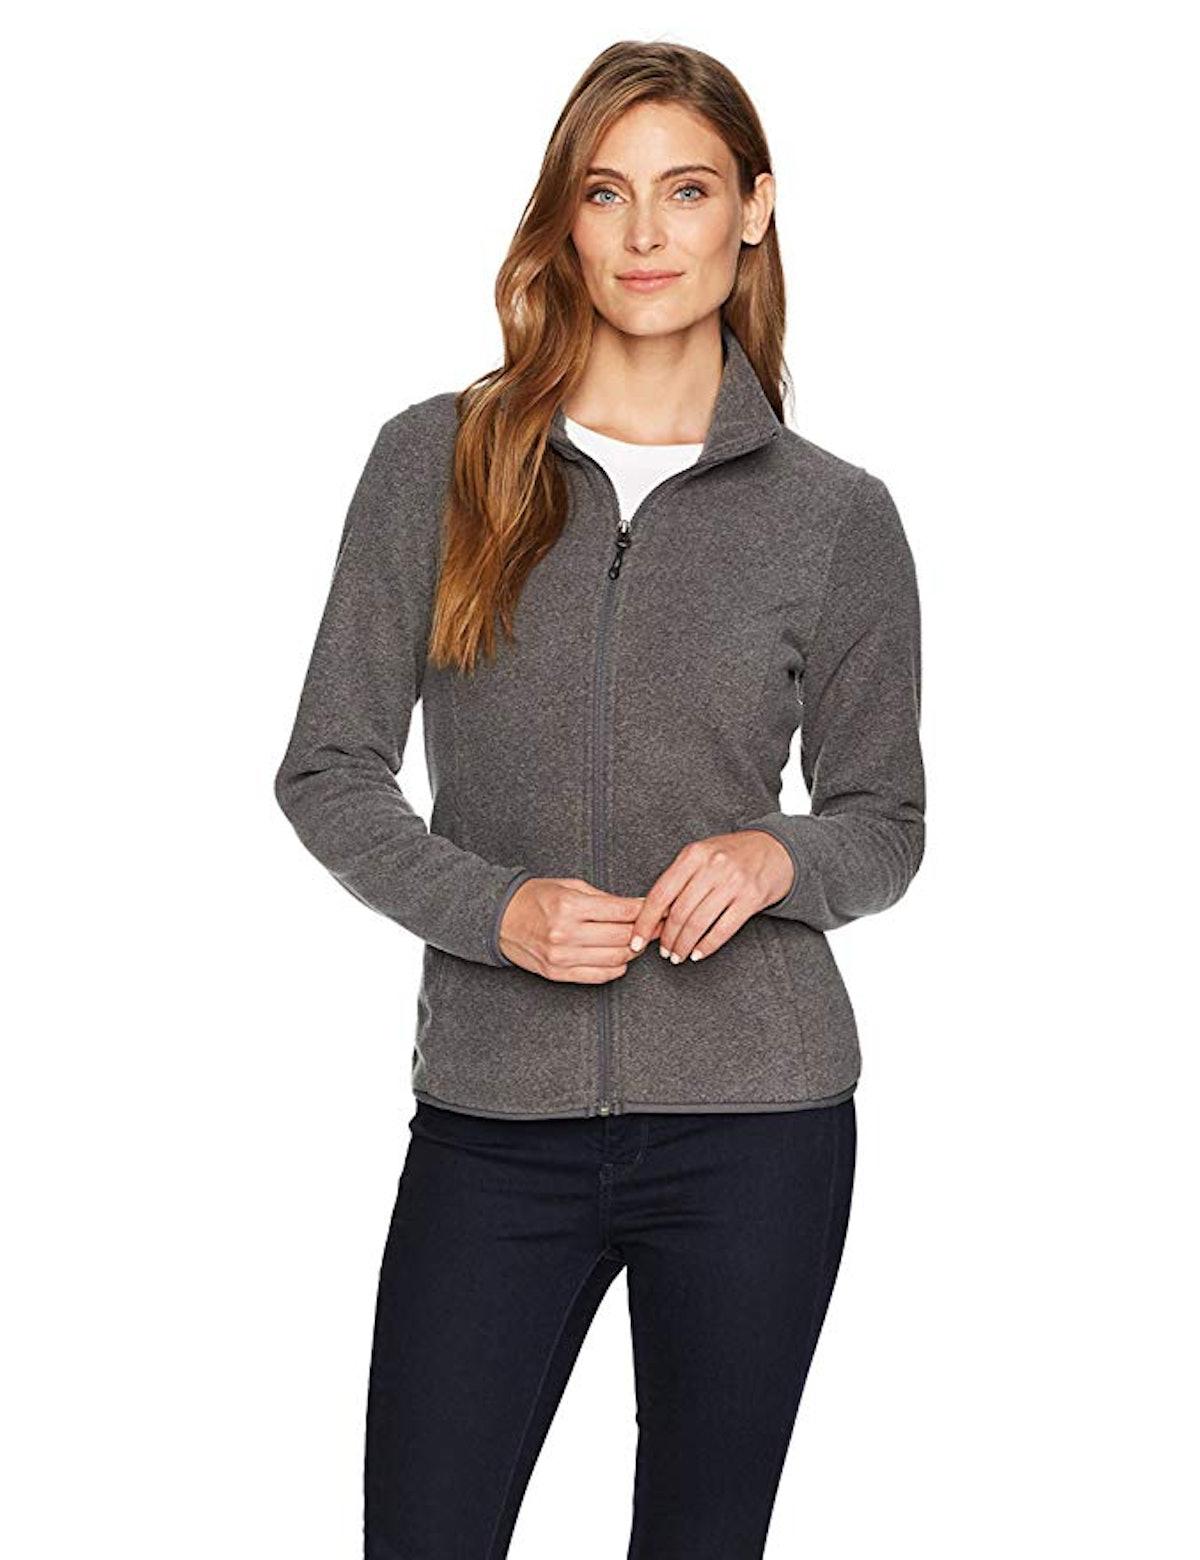 Amazon Essentials Women's Polar Fleece Jacket